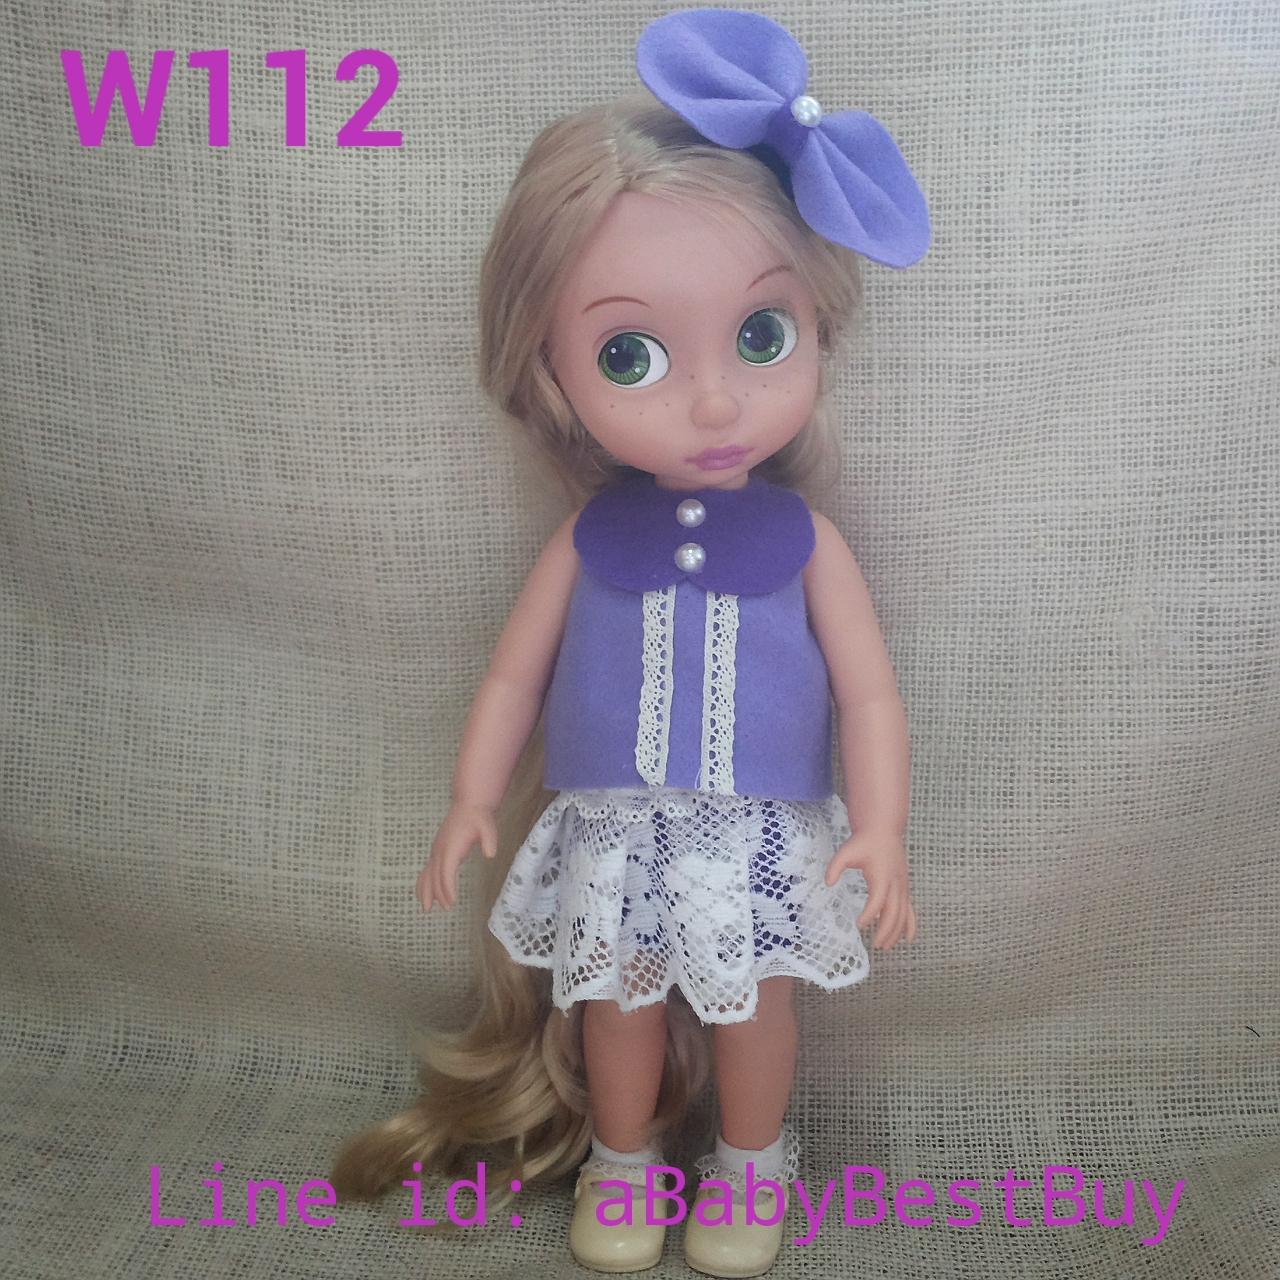 W112 เสื้อผ้าตุ๊กตา- Disney Animators' Collection Doll - 16'' (พร้อมส่่ง))